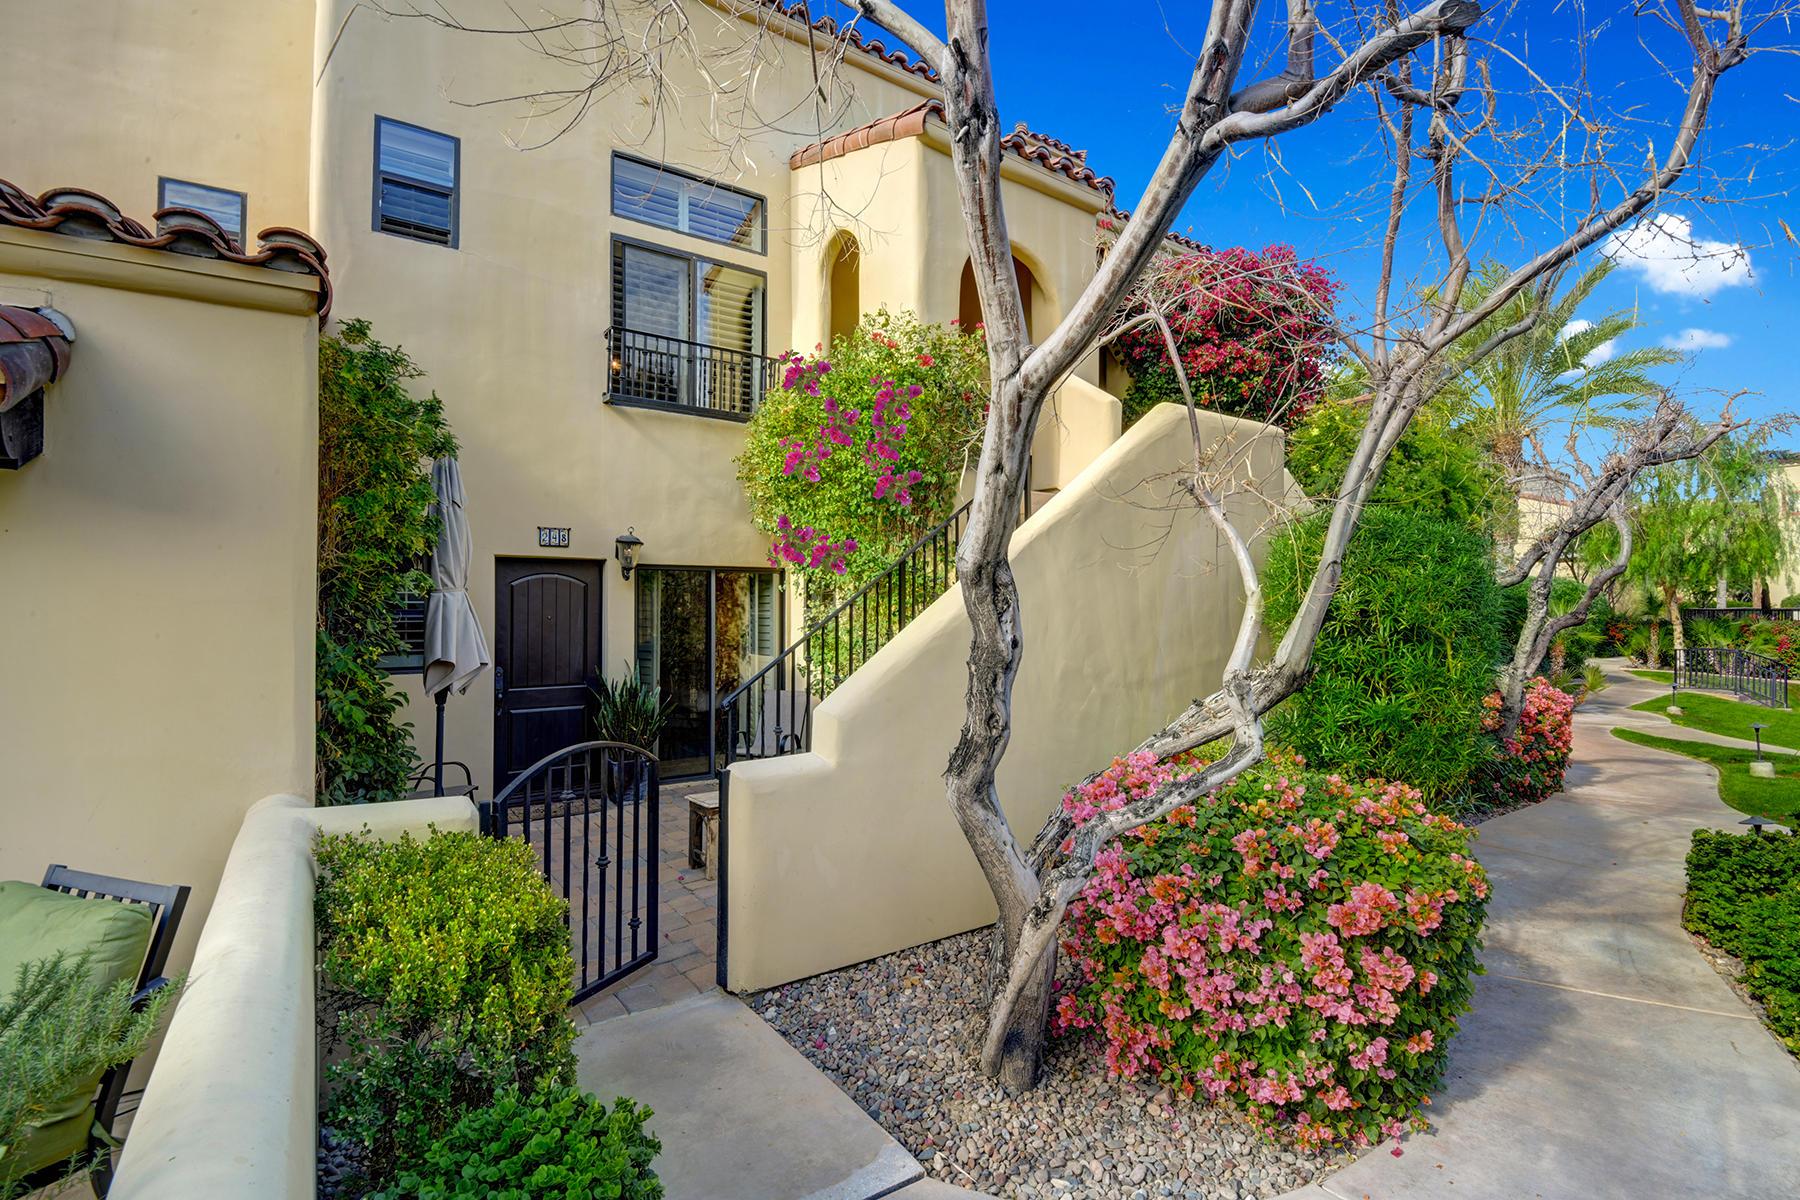 219056268PS 1 - Cypress Garden Villas Hawaiian Gardens Ca